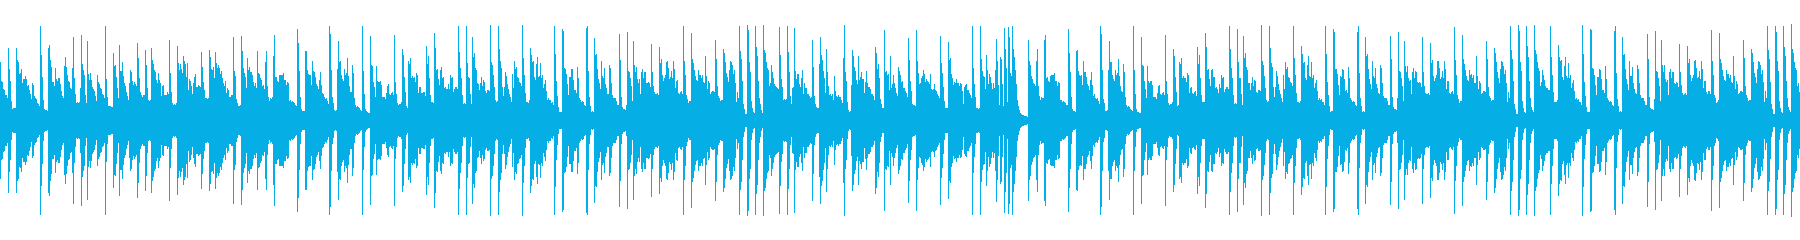 BGM008-02 トランプのカードゲ…の再生済みの波形